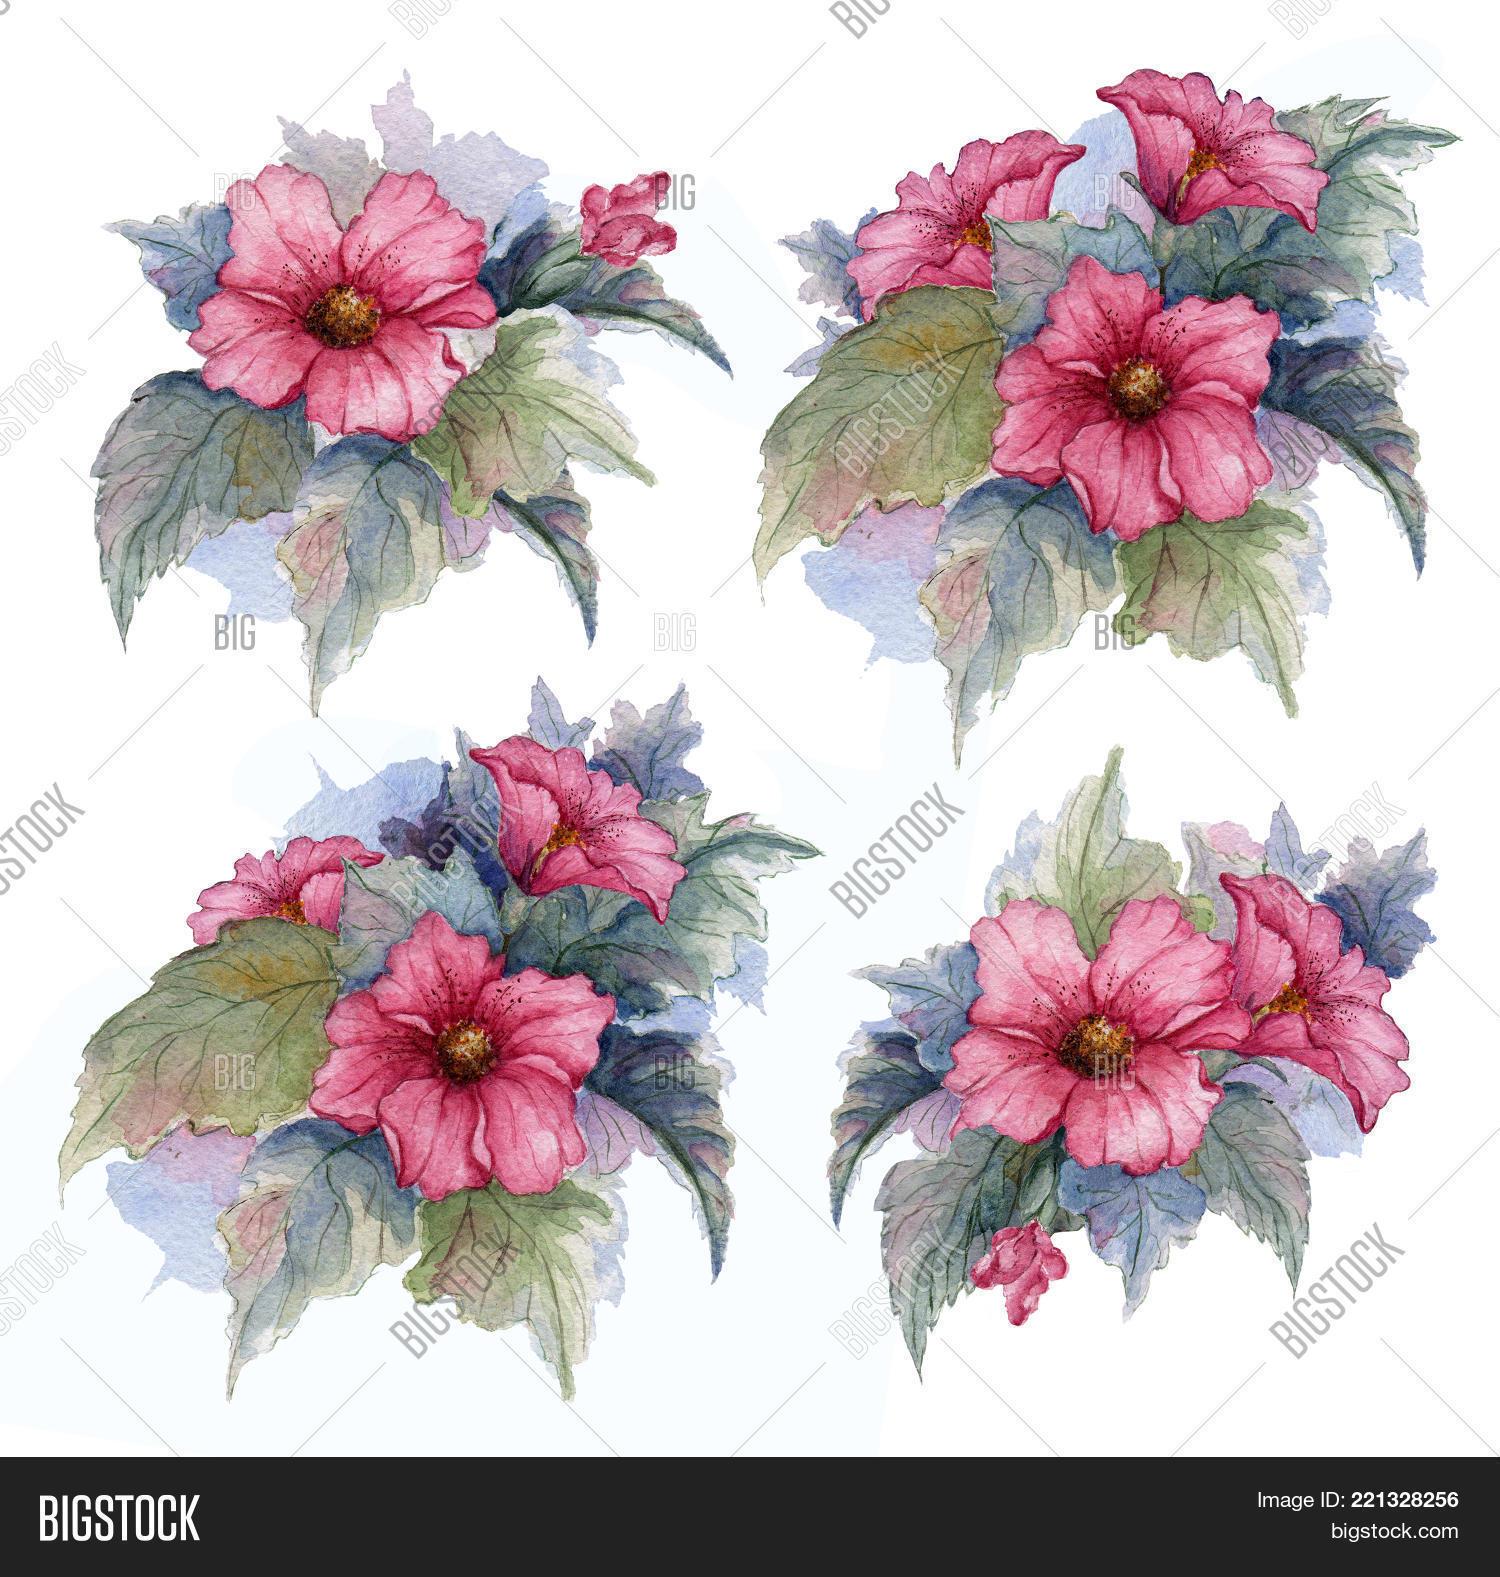 Beautiful Bouquets Image Photo Free Trial Bigstock